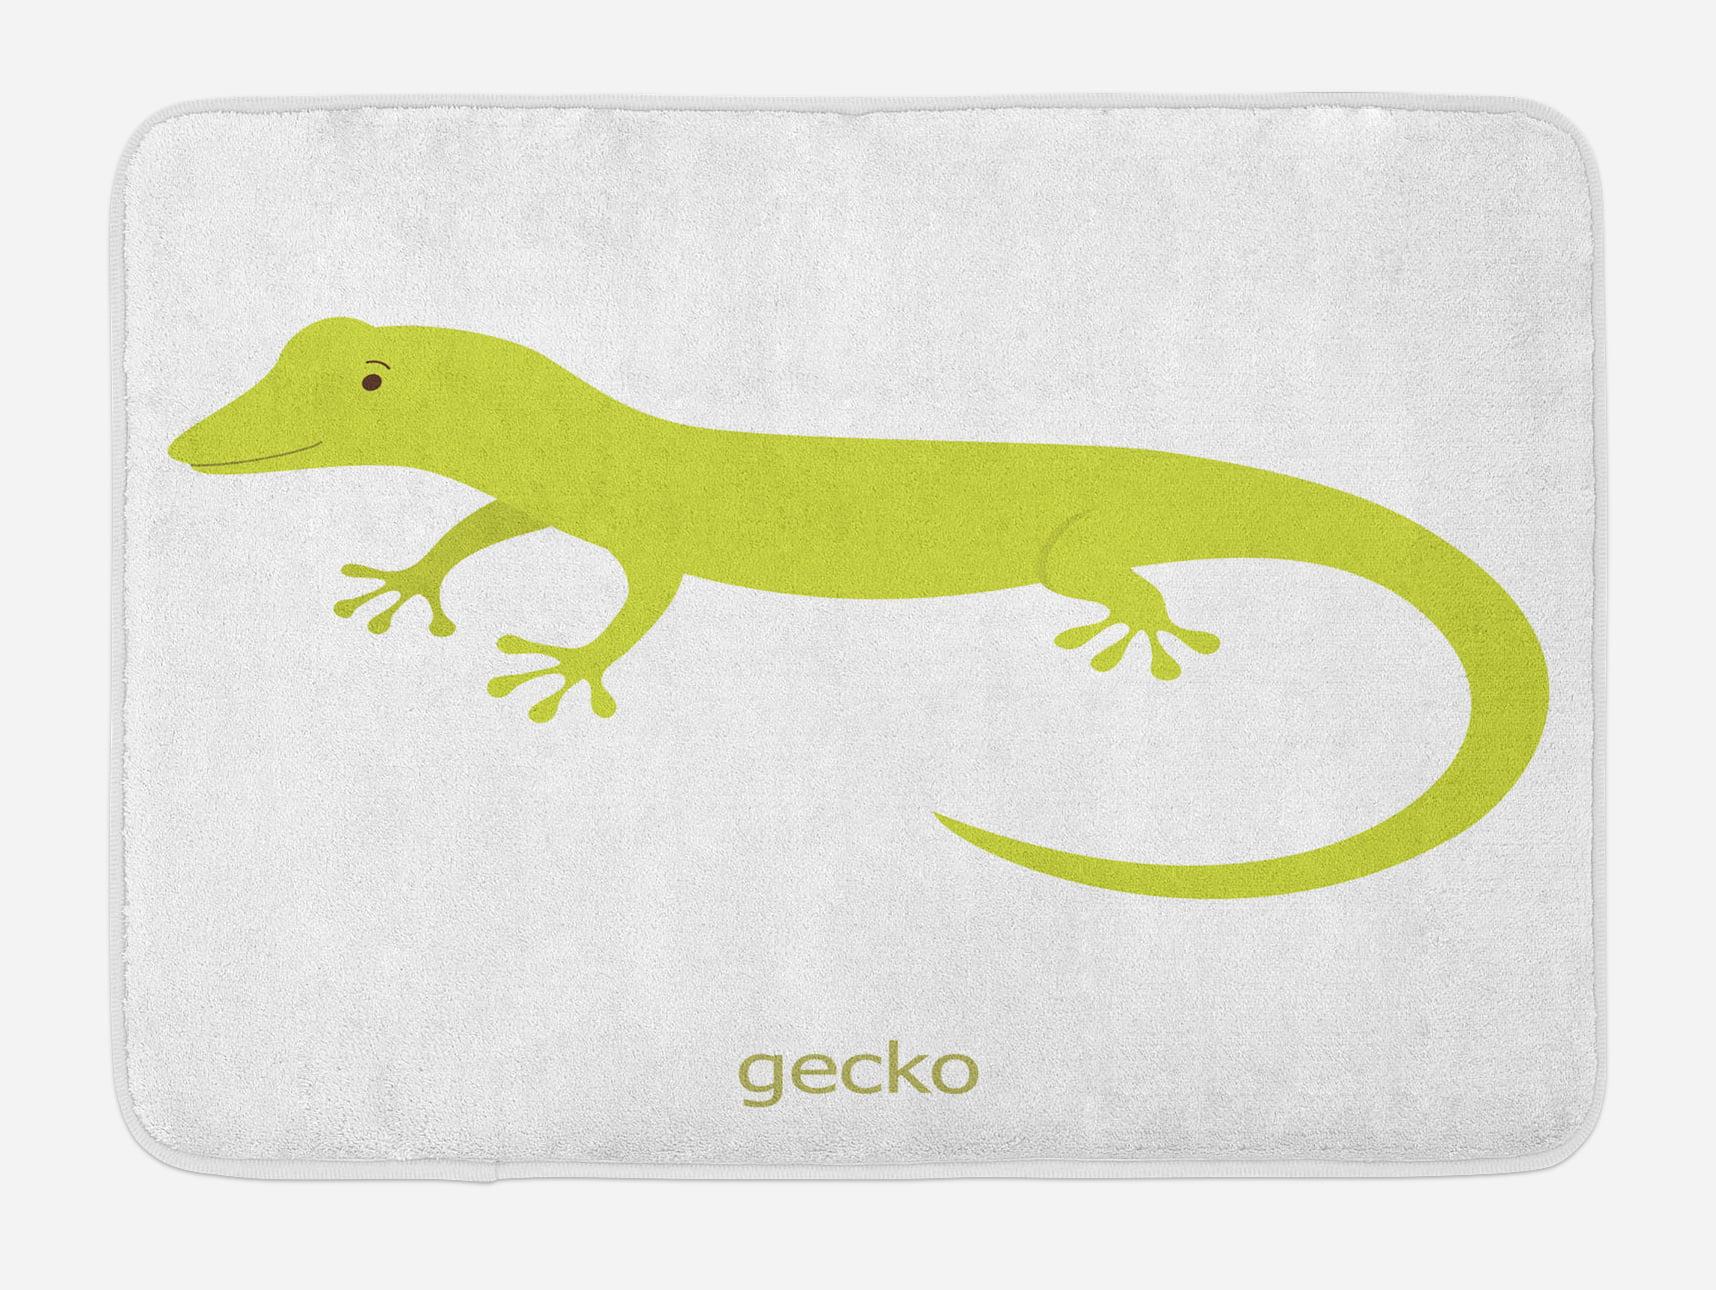 Reptile Bath Mat, Cute Australian Lizard Illustration Smiling Kids Mascot Safari Theme... by 3decor llc